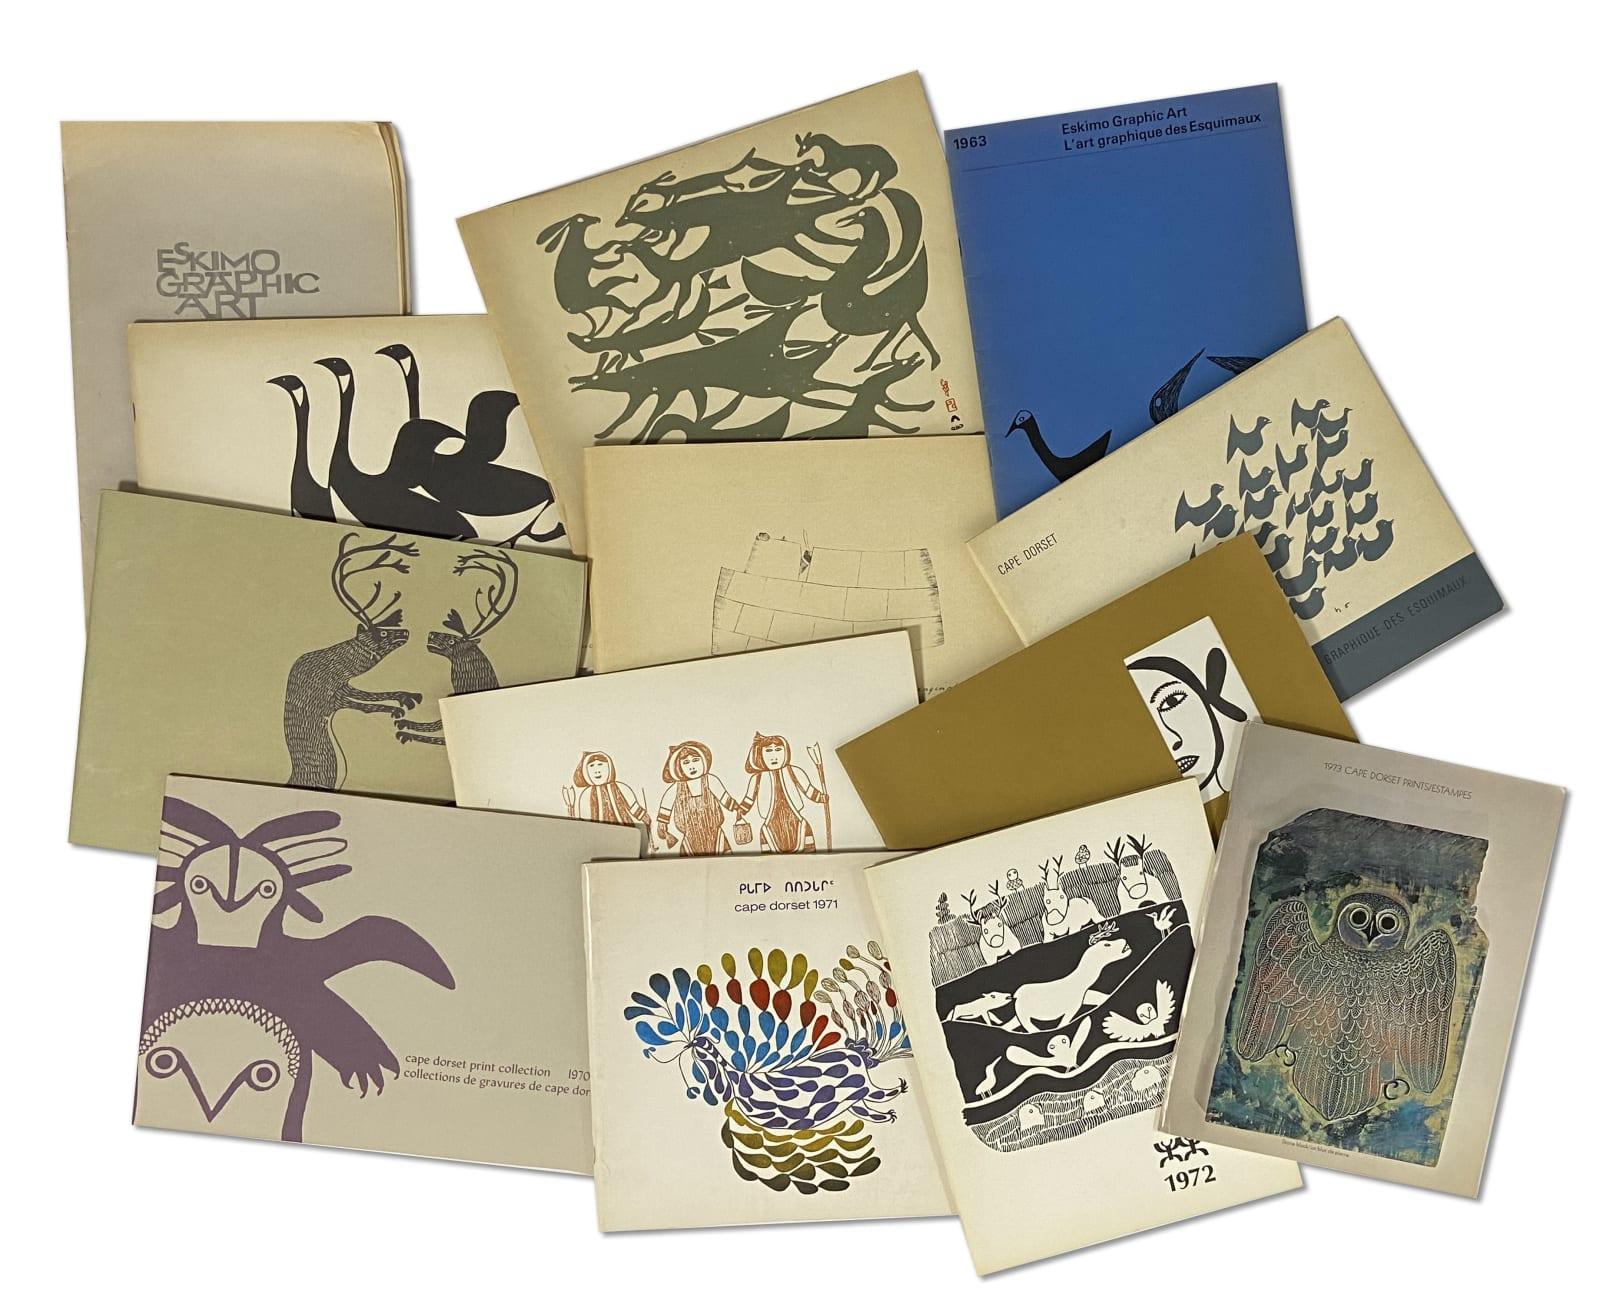 Lot 83 Quantity of Cape Dorset Annual Print Catalogues Estimate: $150 — $250